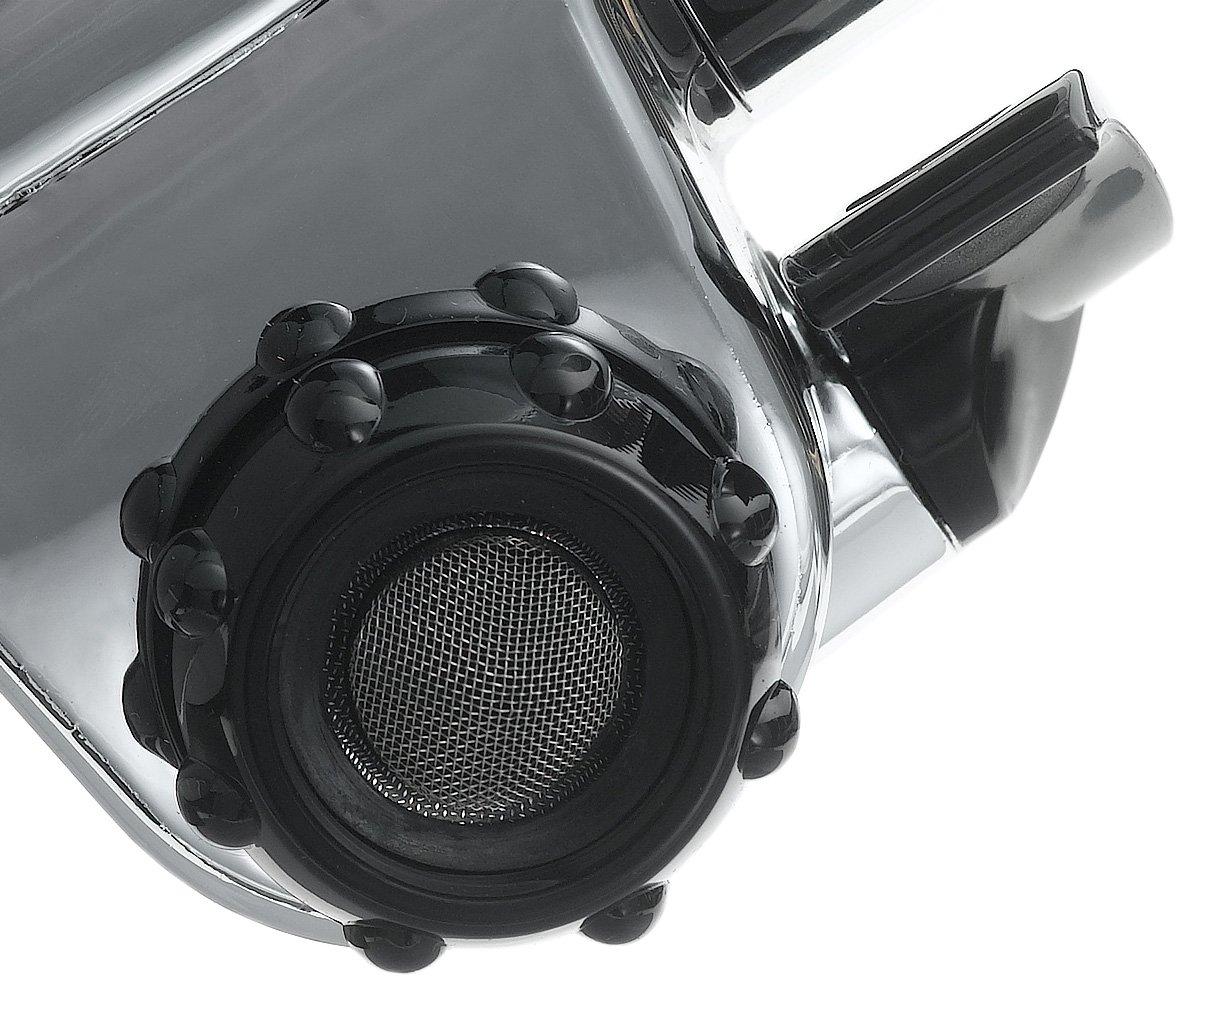 Brita Disposable Faucet Filtration System - Faucet Mount Water ...